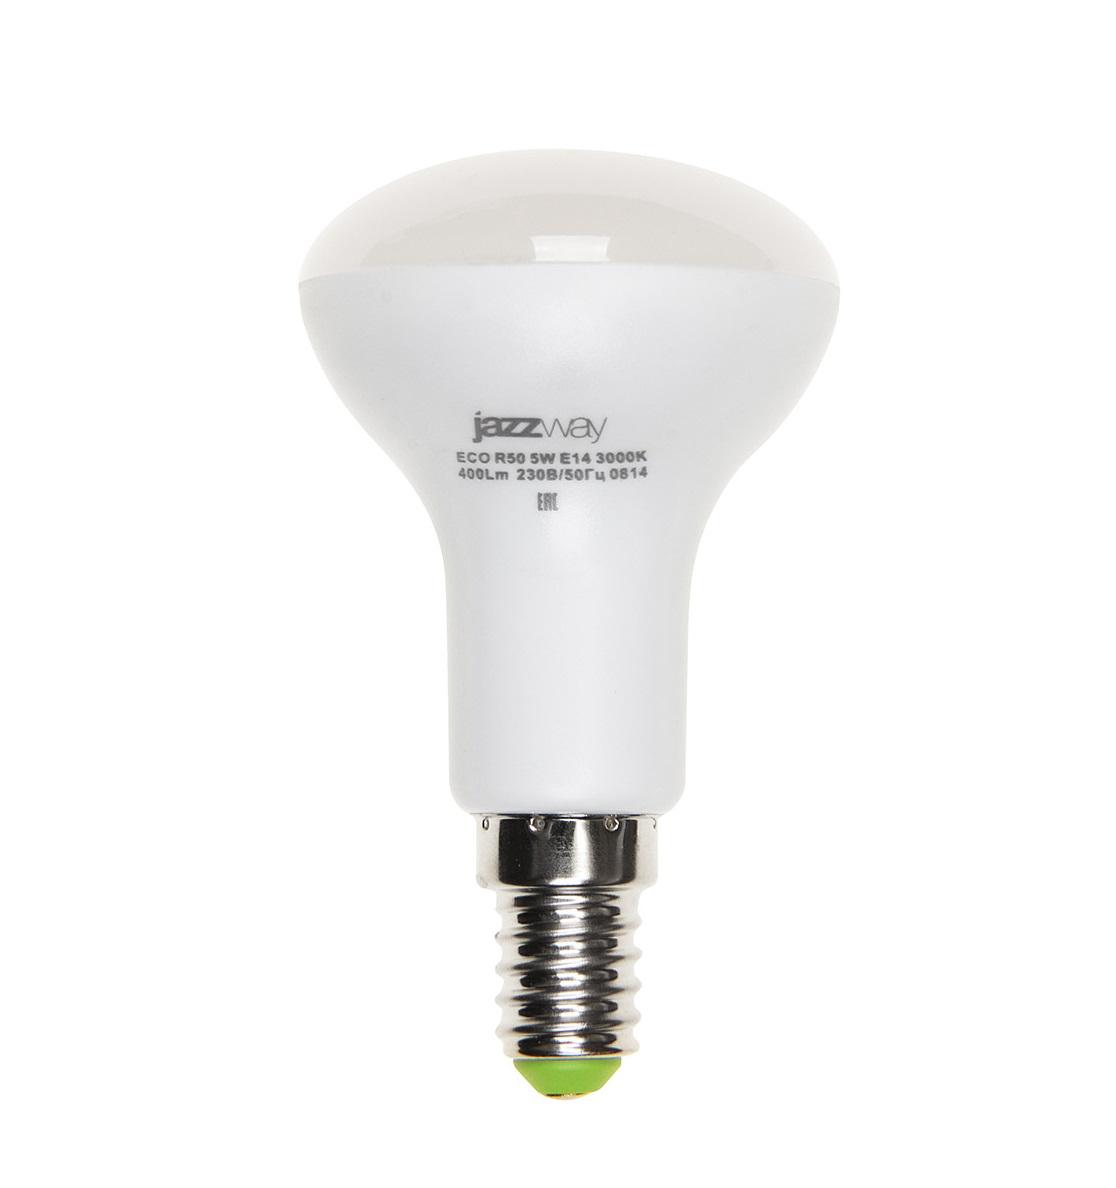 Pled-eco-r50, Лампа светодиодная